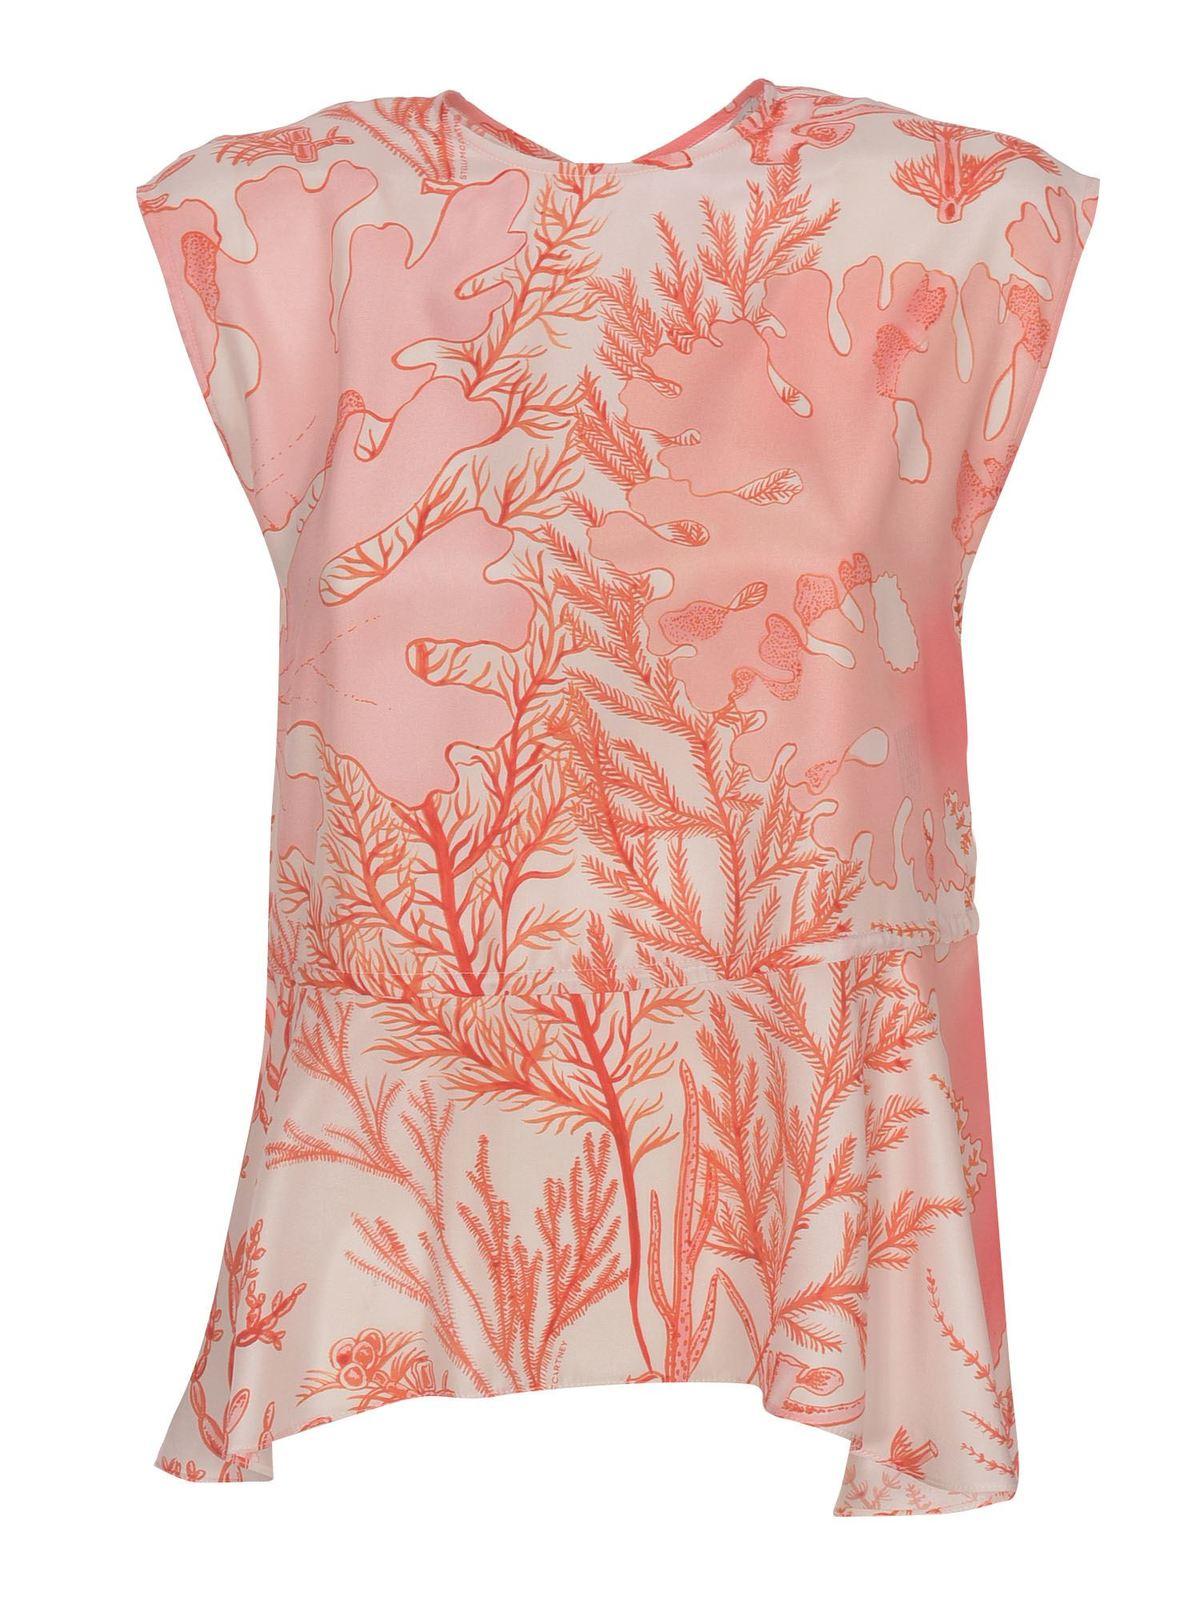 Stella Mccartney Clothing CORAL PRINT PEPLUM TOP IN PINK